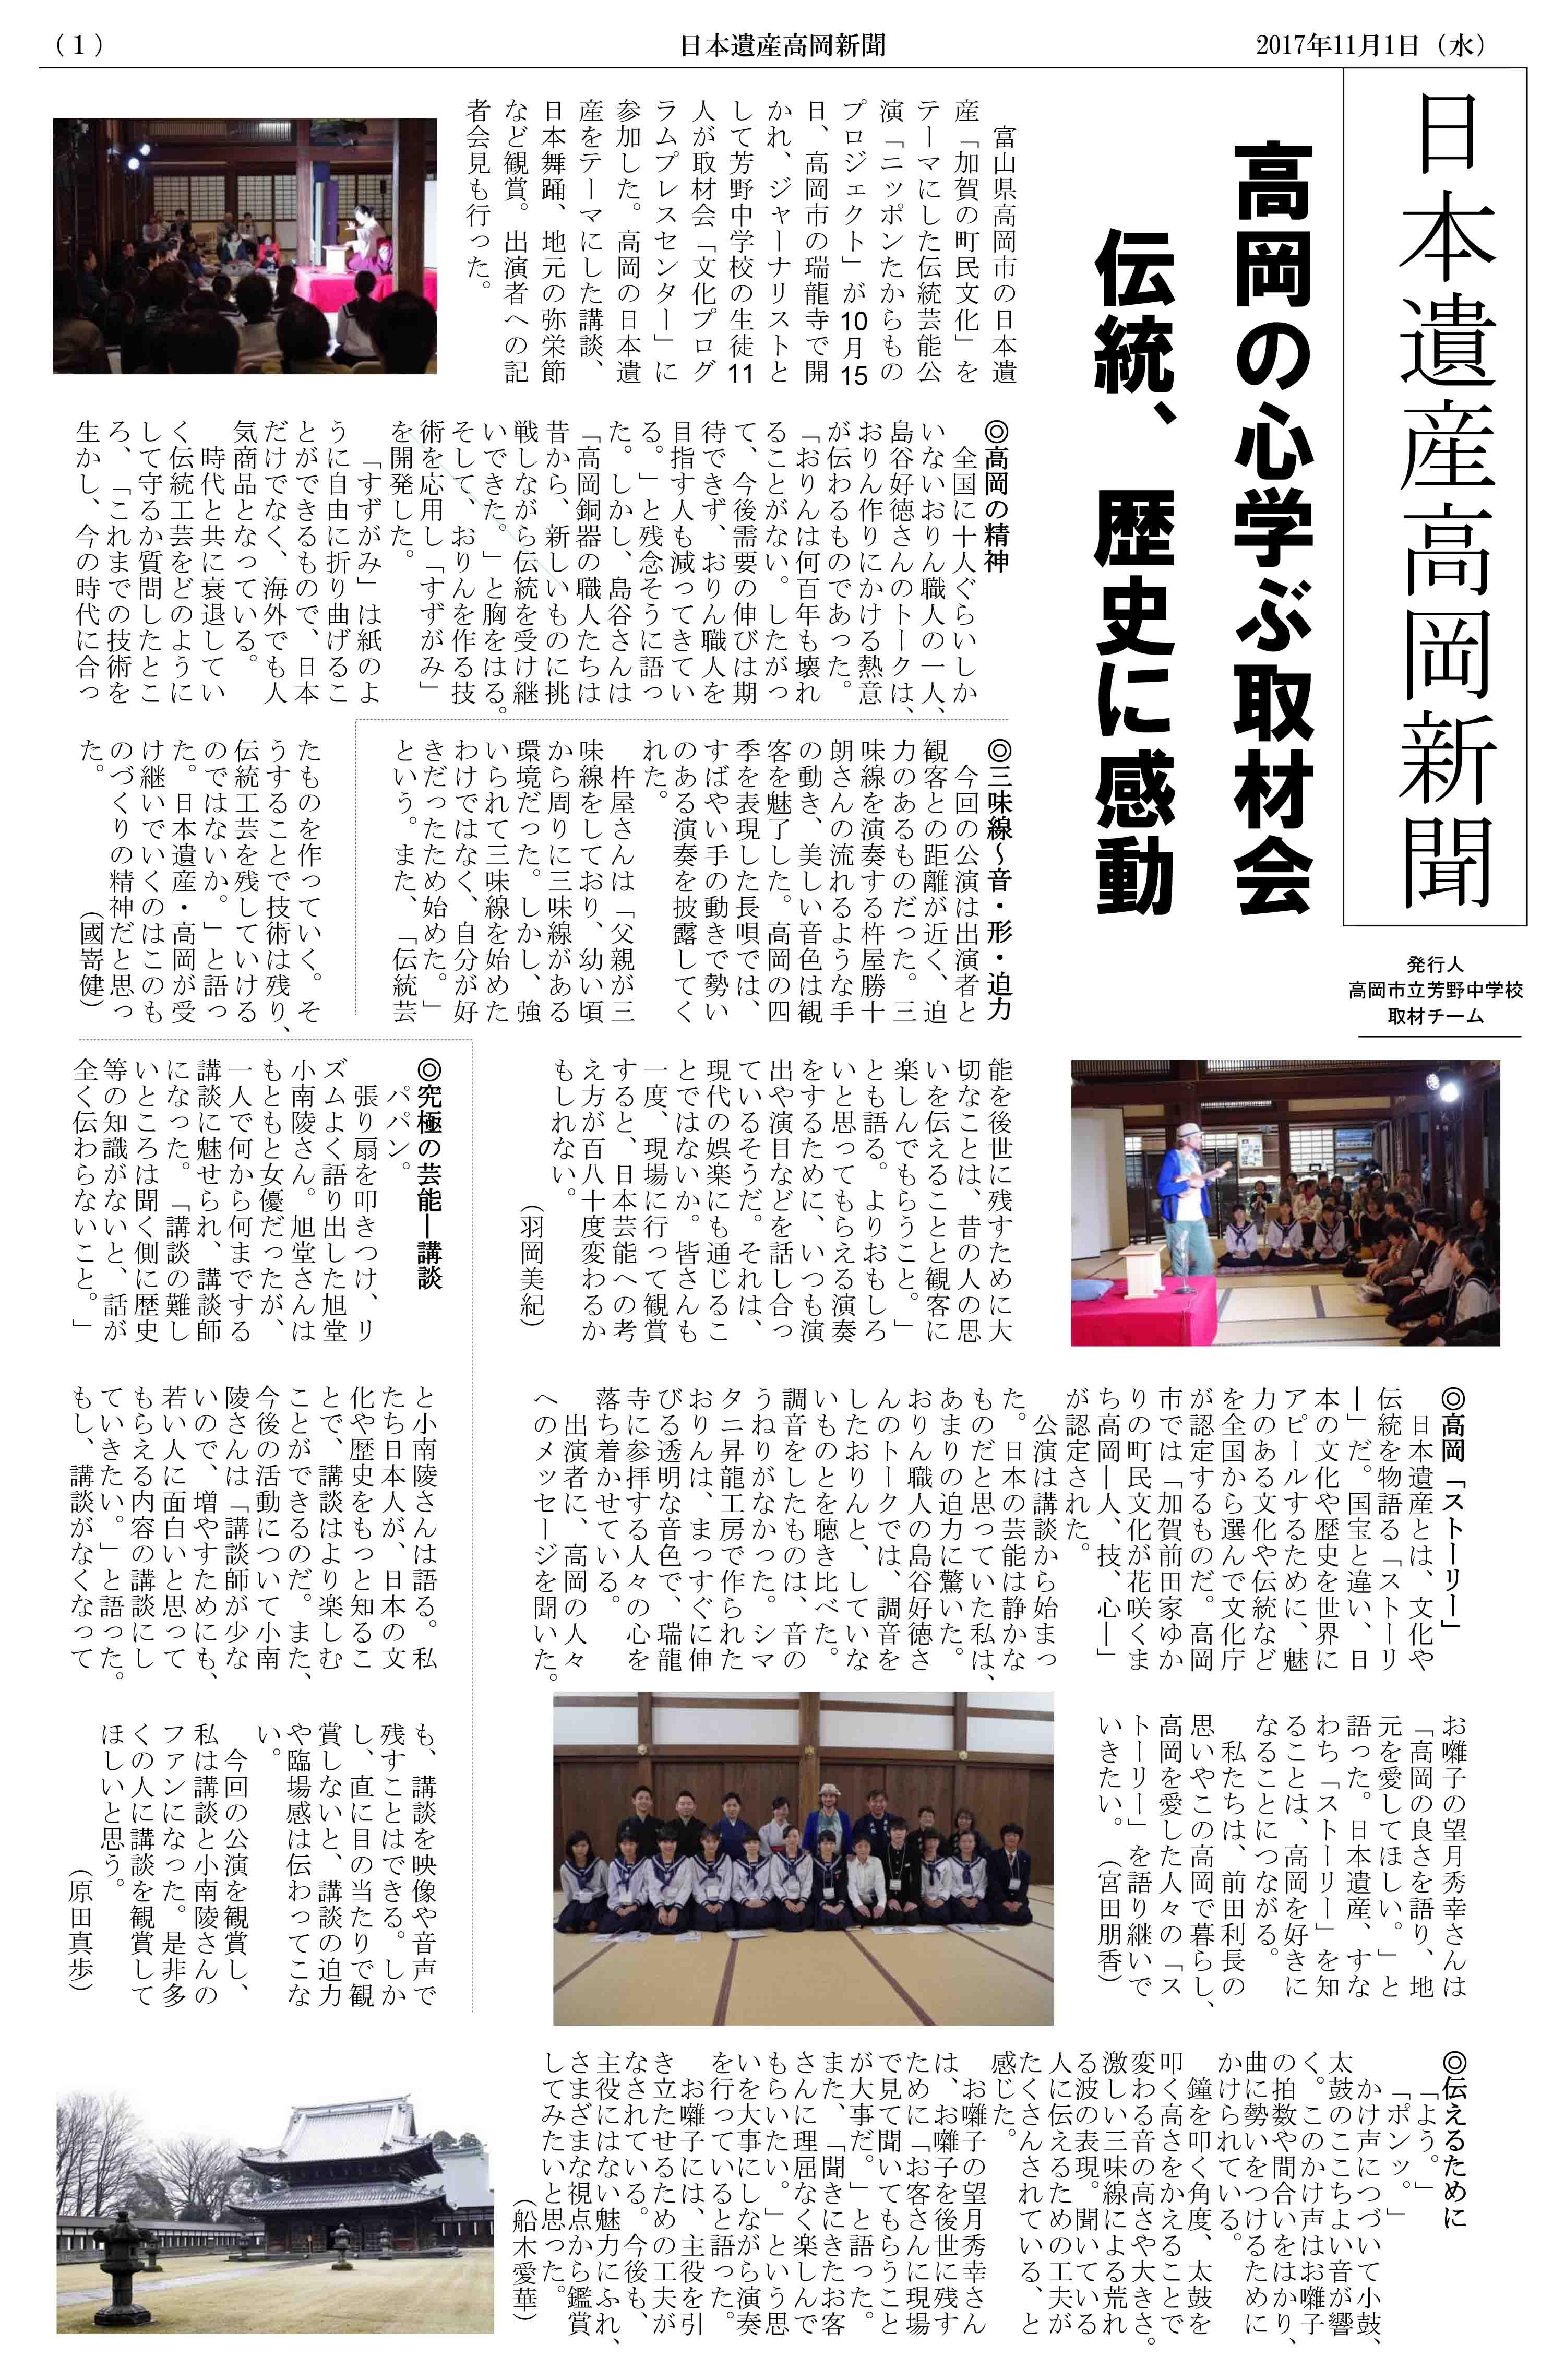 http://bunp.47news.jp/event/images/mini_nihonheritage_takaoka011710.jpg